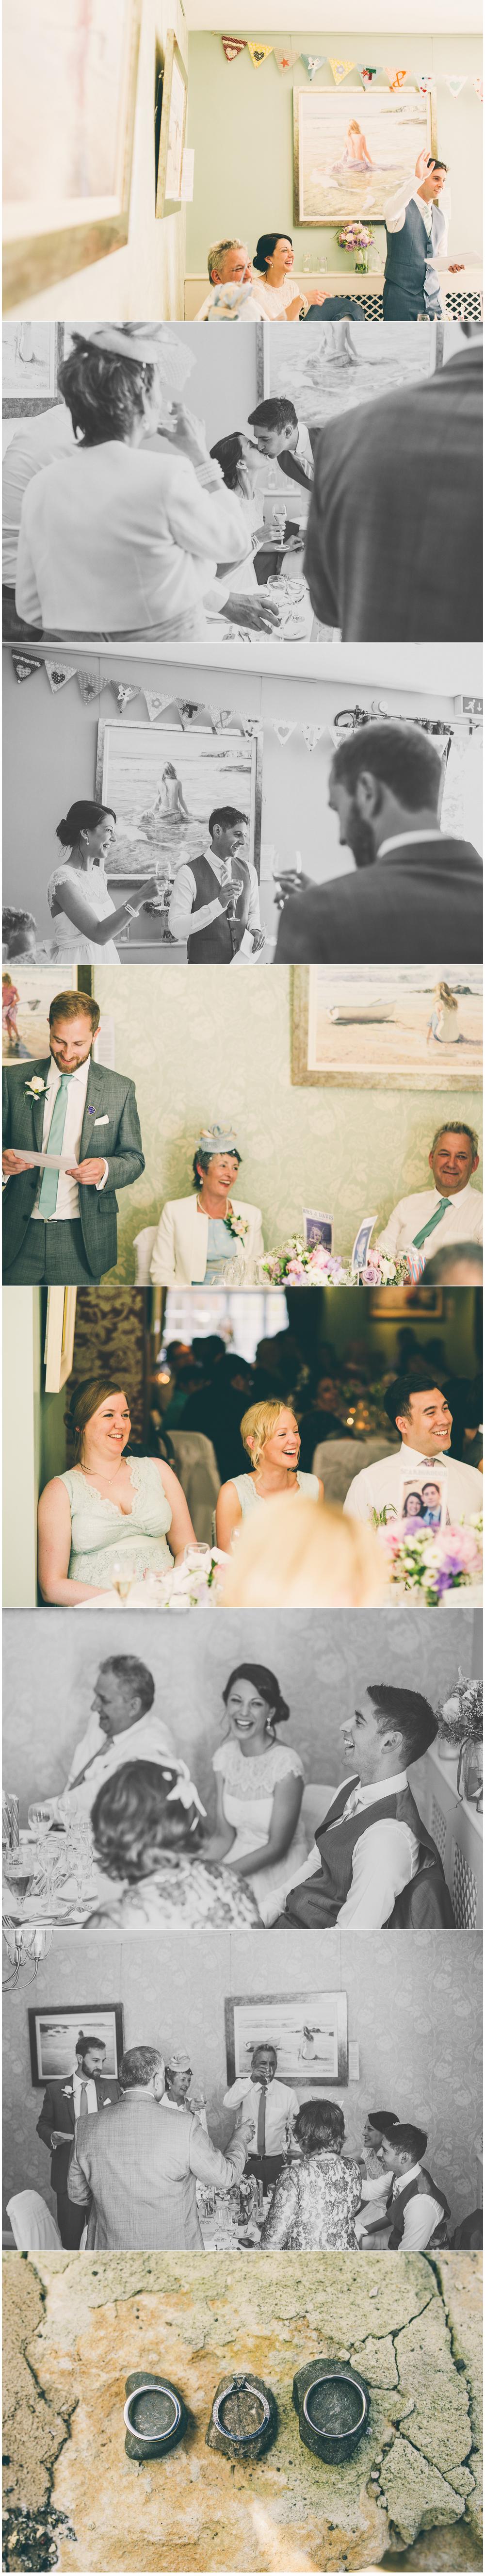 Neil_Jackson_Photographic_Scarborough_York_Yorkshire_Wedding_Photographer_Julie_Jon_Black_Swan_Helmsley_Wedding_Shoot_Blog12